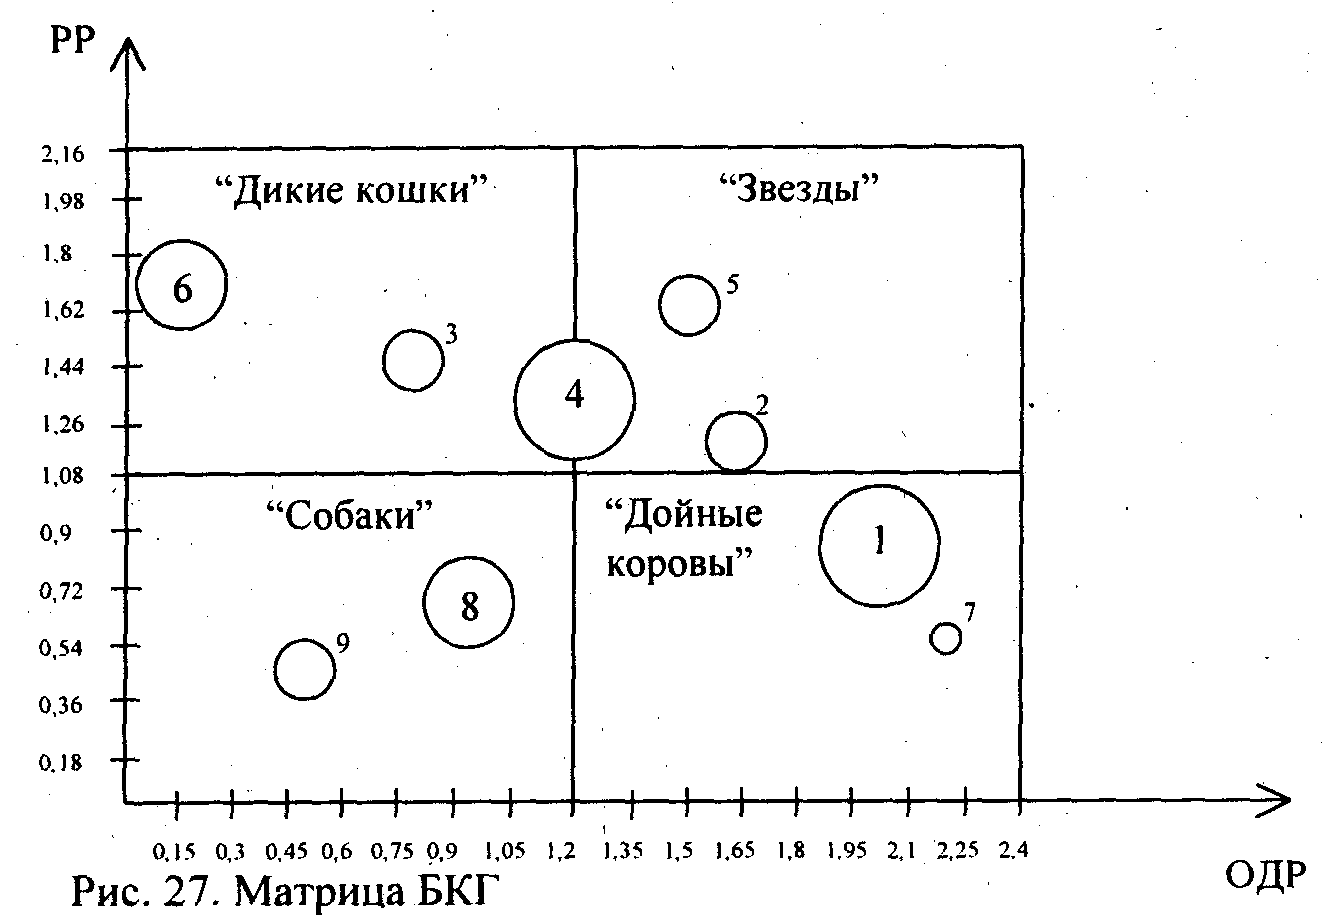 bcg matrix of proton holding